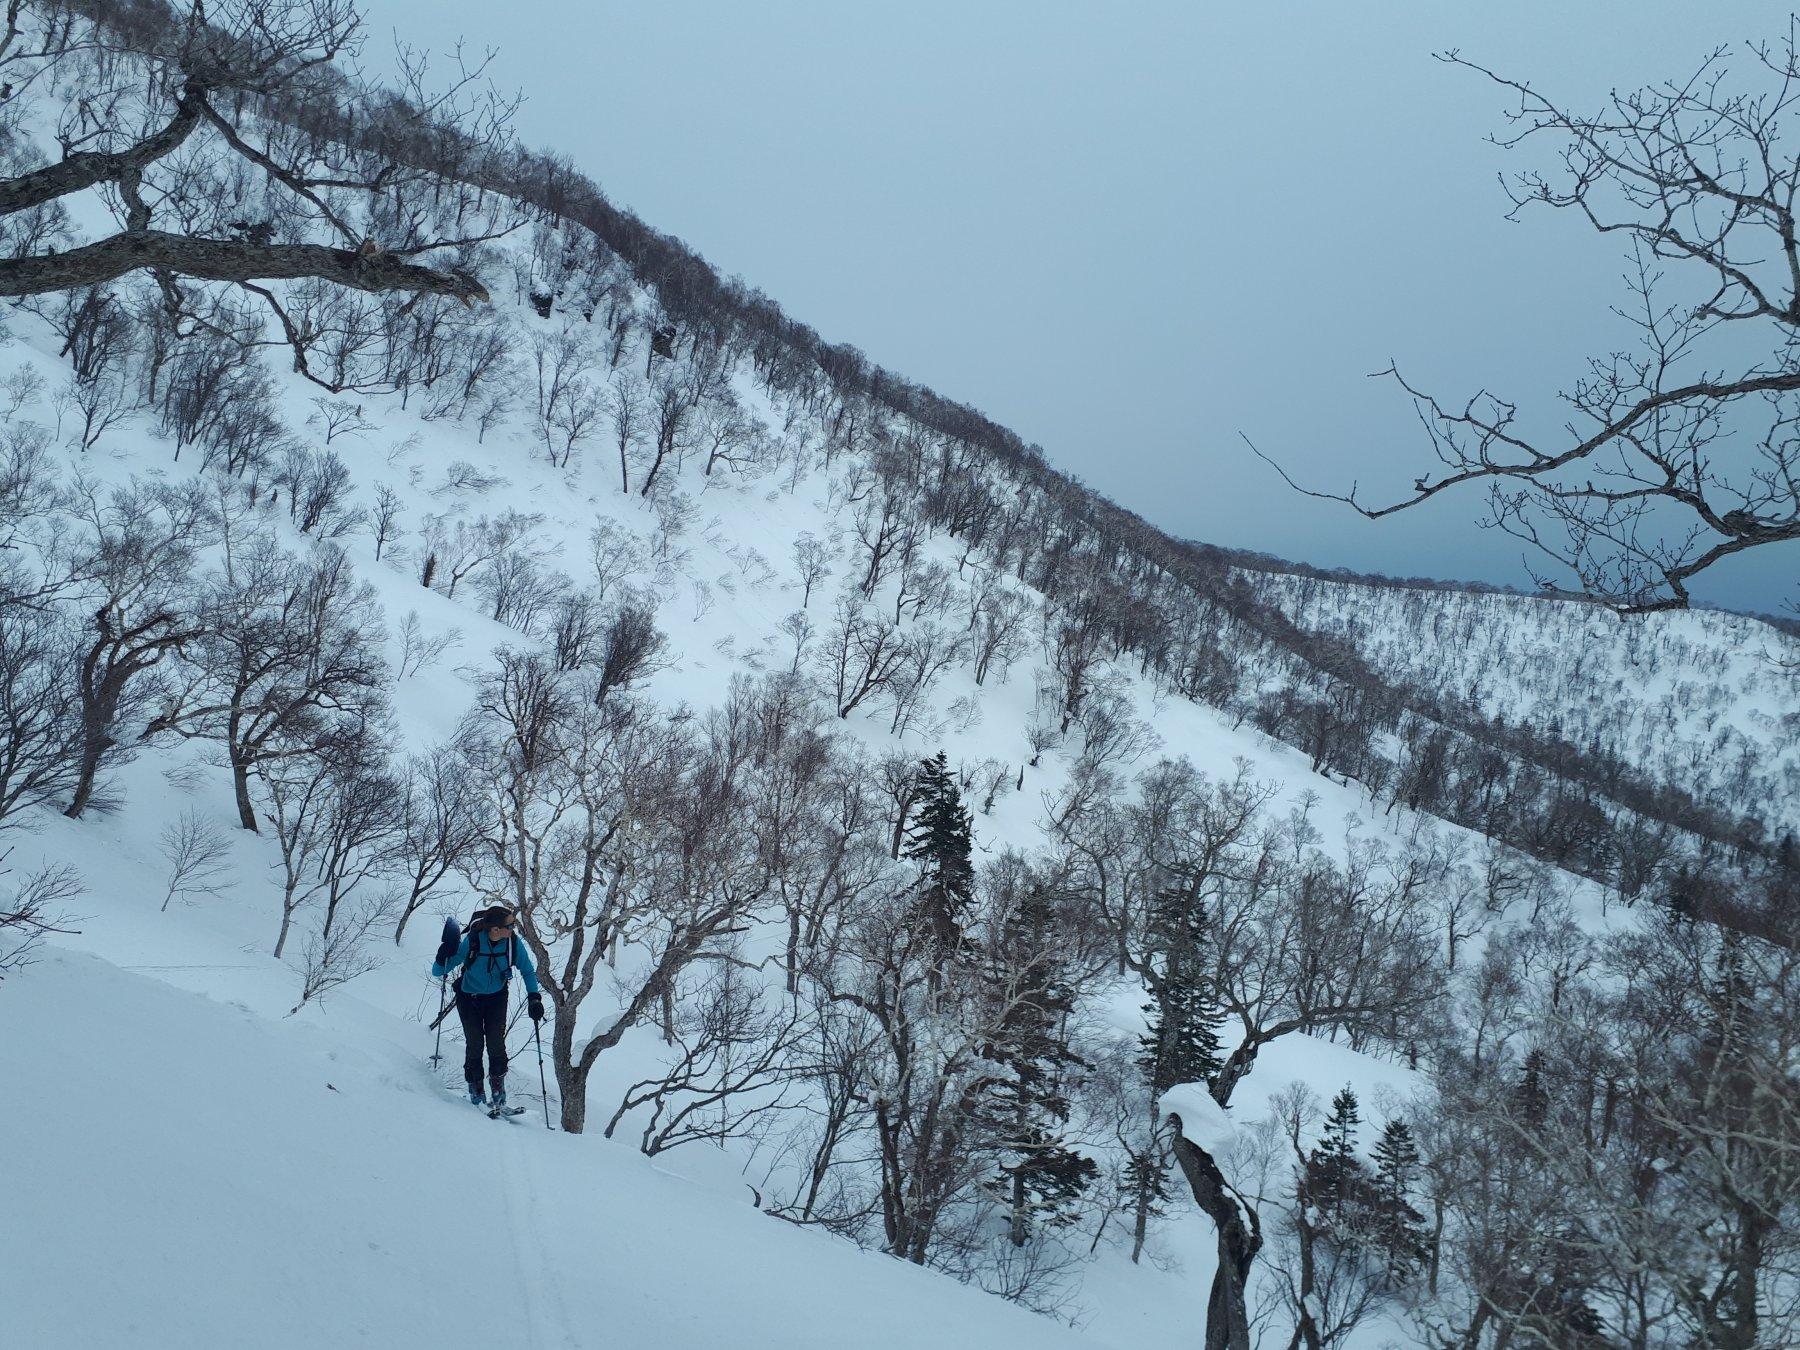 Kumbetsu West coast, Hokkaido 2019-03-11